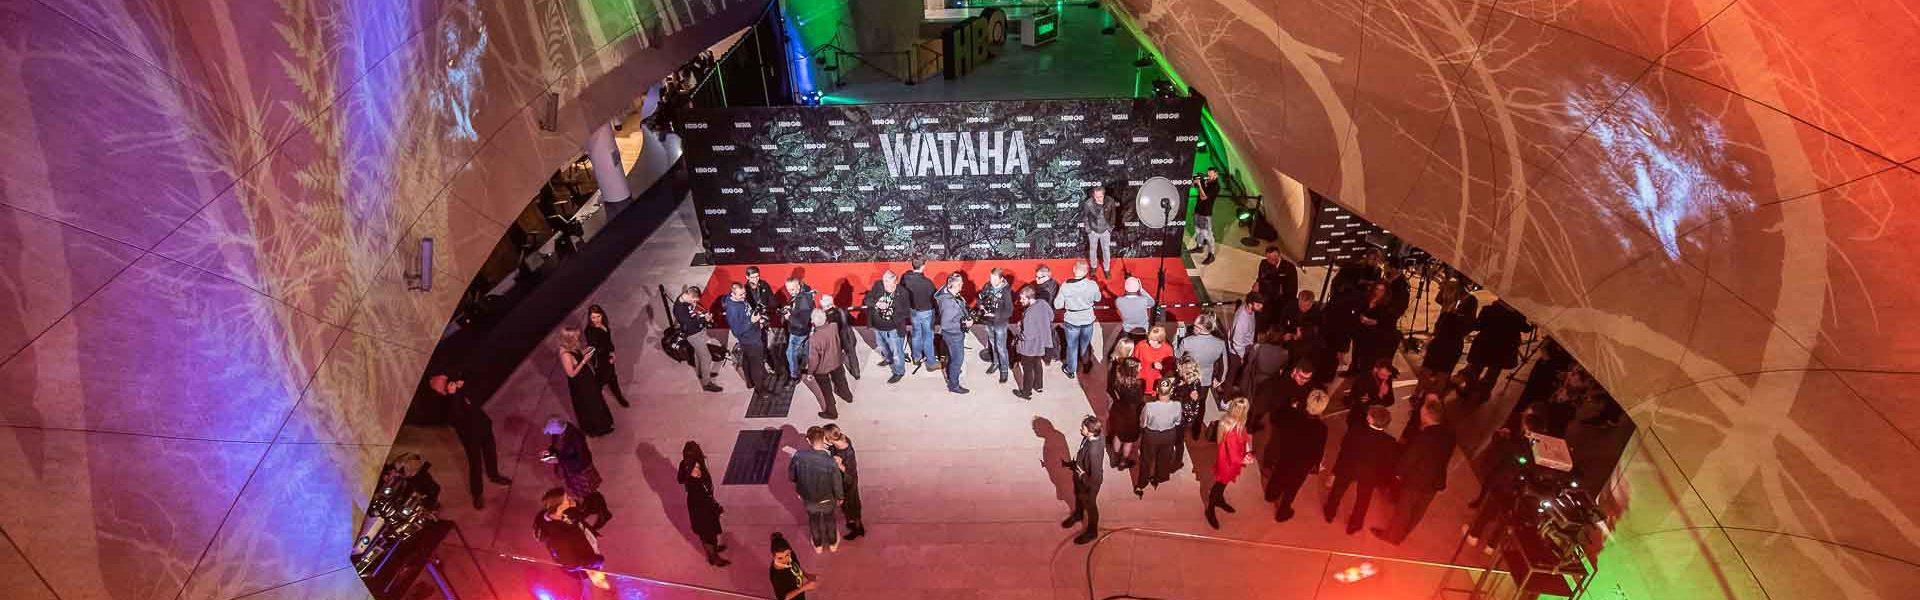 Wataha-fotografia-eventowa-13